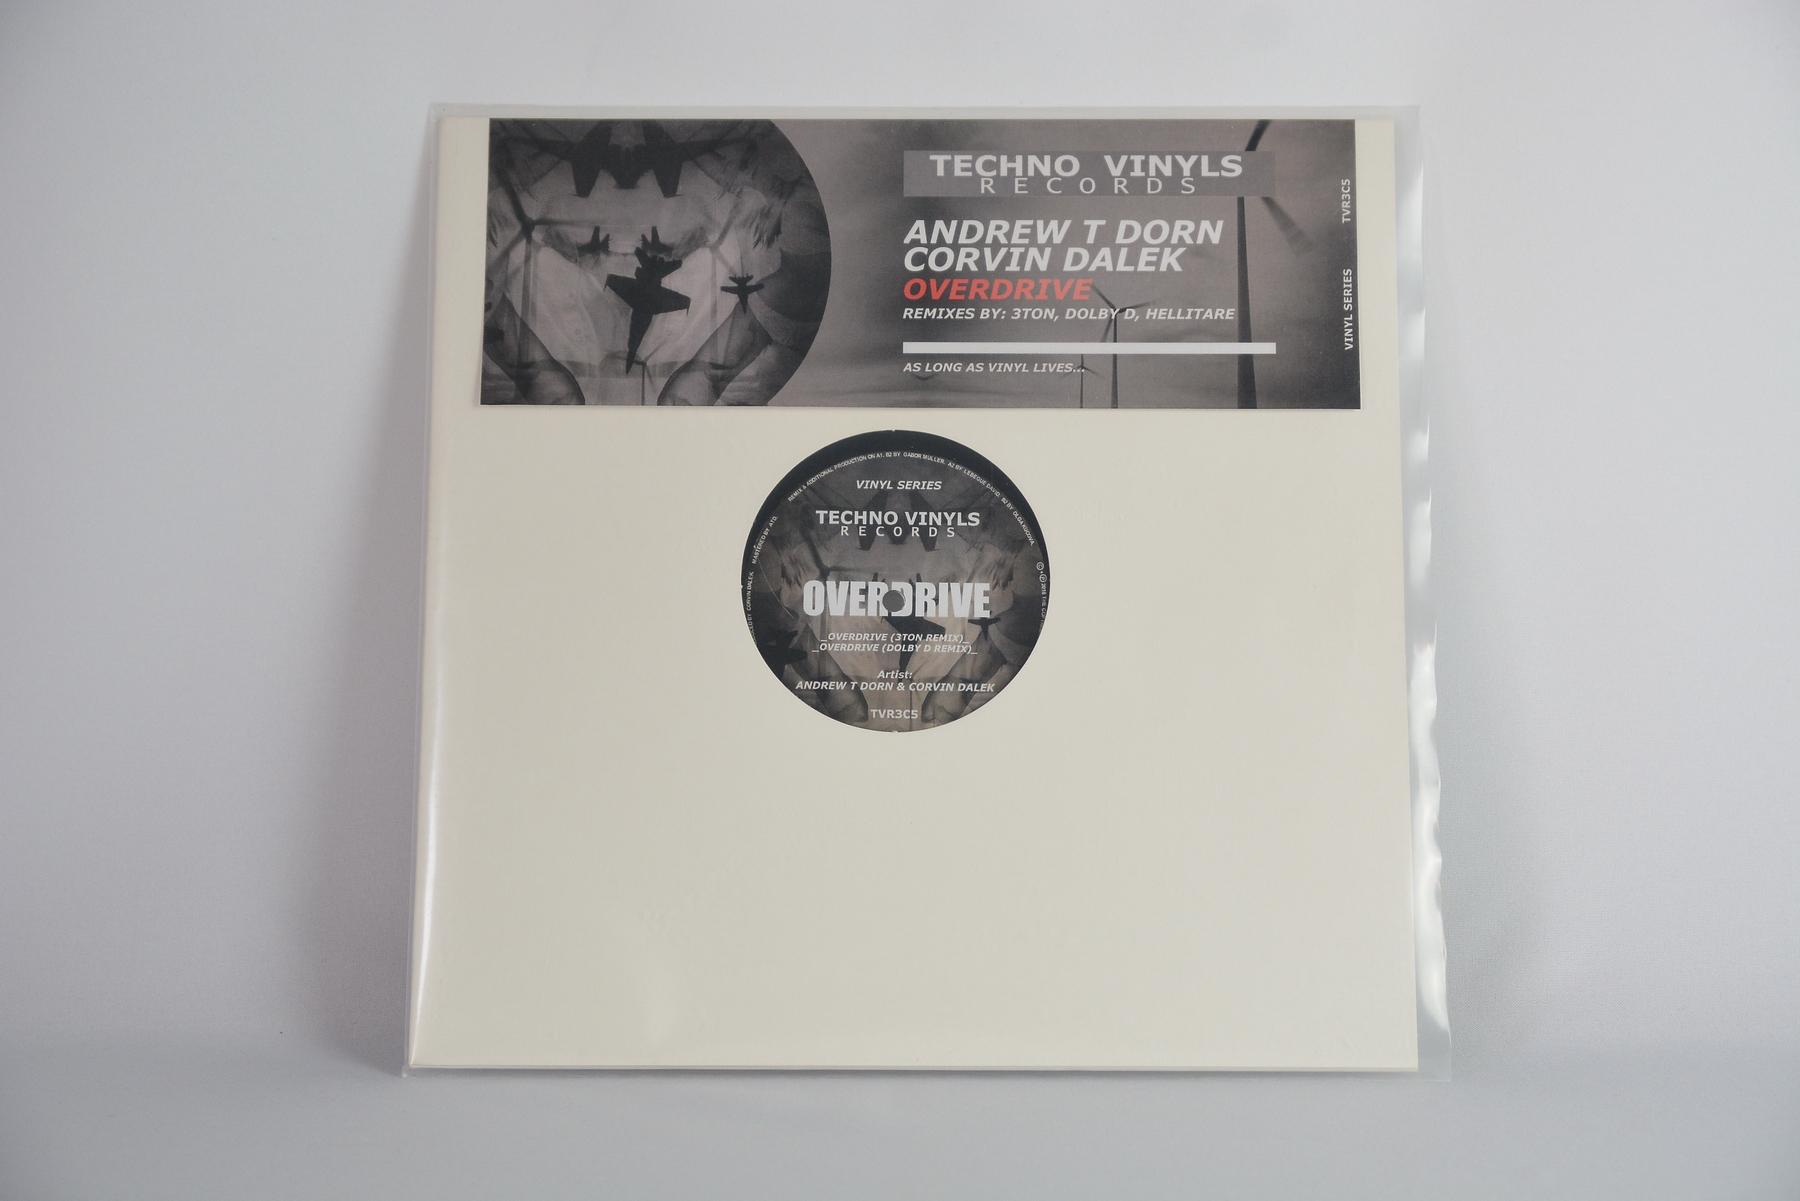 Andrew T Dorn & Corvin Dalek – Overdrive (Remixes)